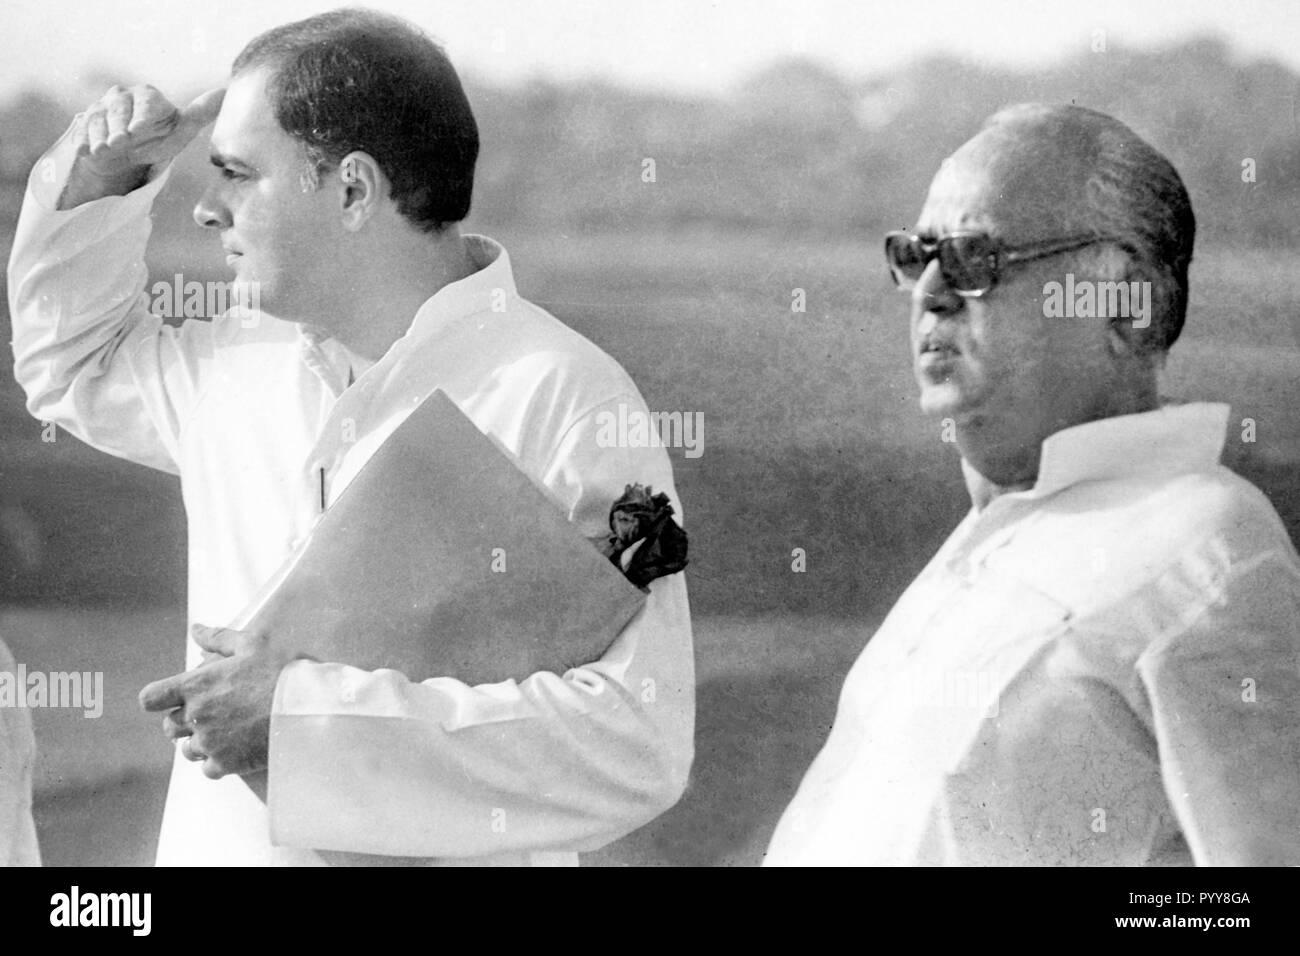 Rajiv Gandhi mit Vasantdada Patil, Mumbai, Maharashtra, Indien, Asien, 1985 Stockbild